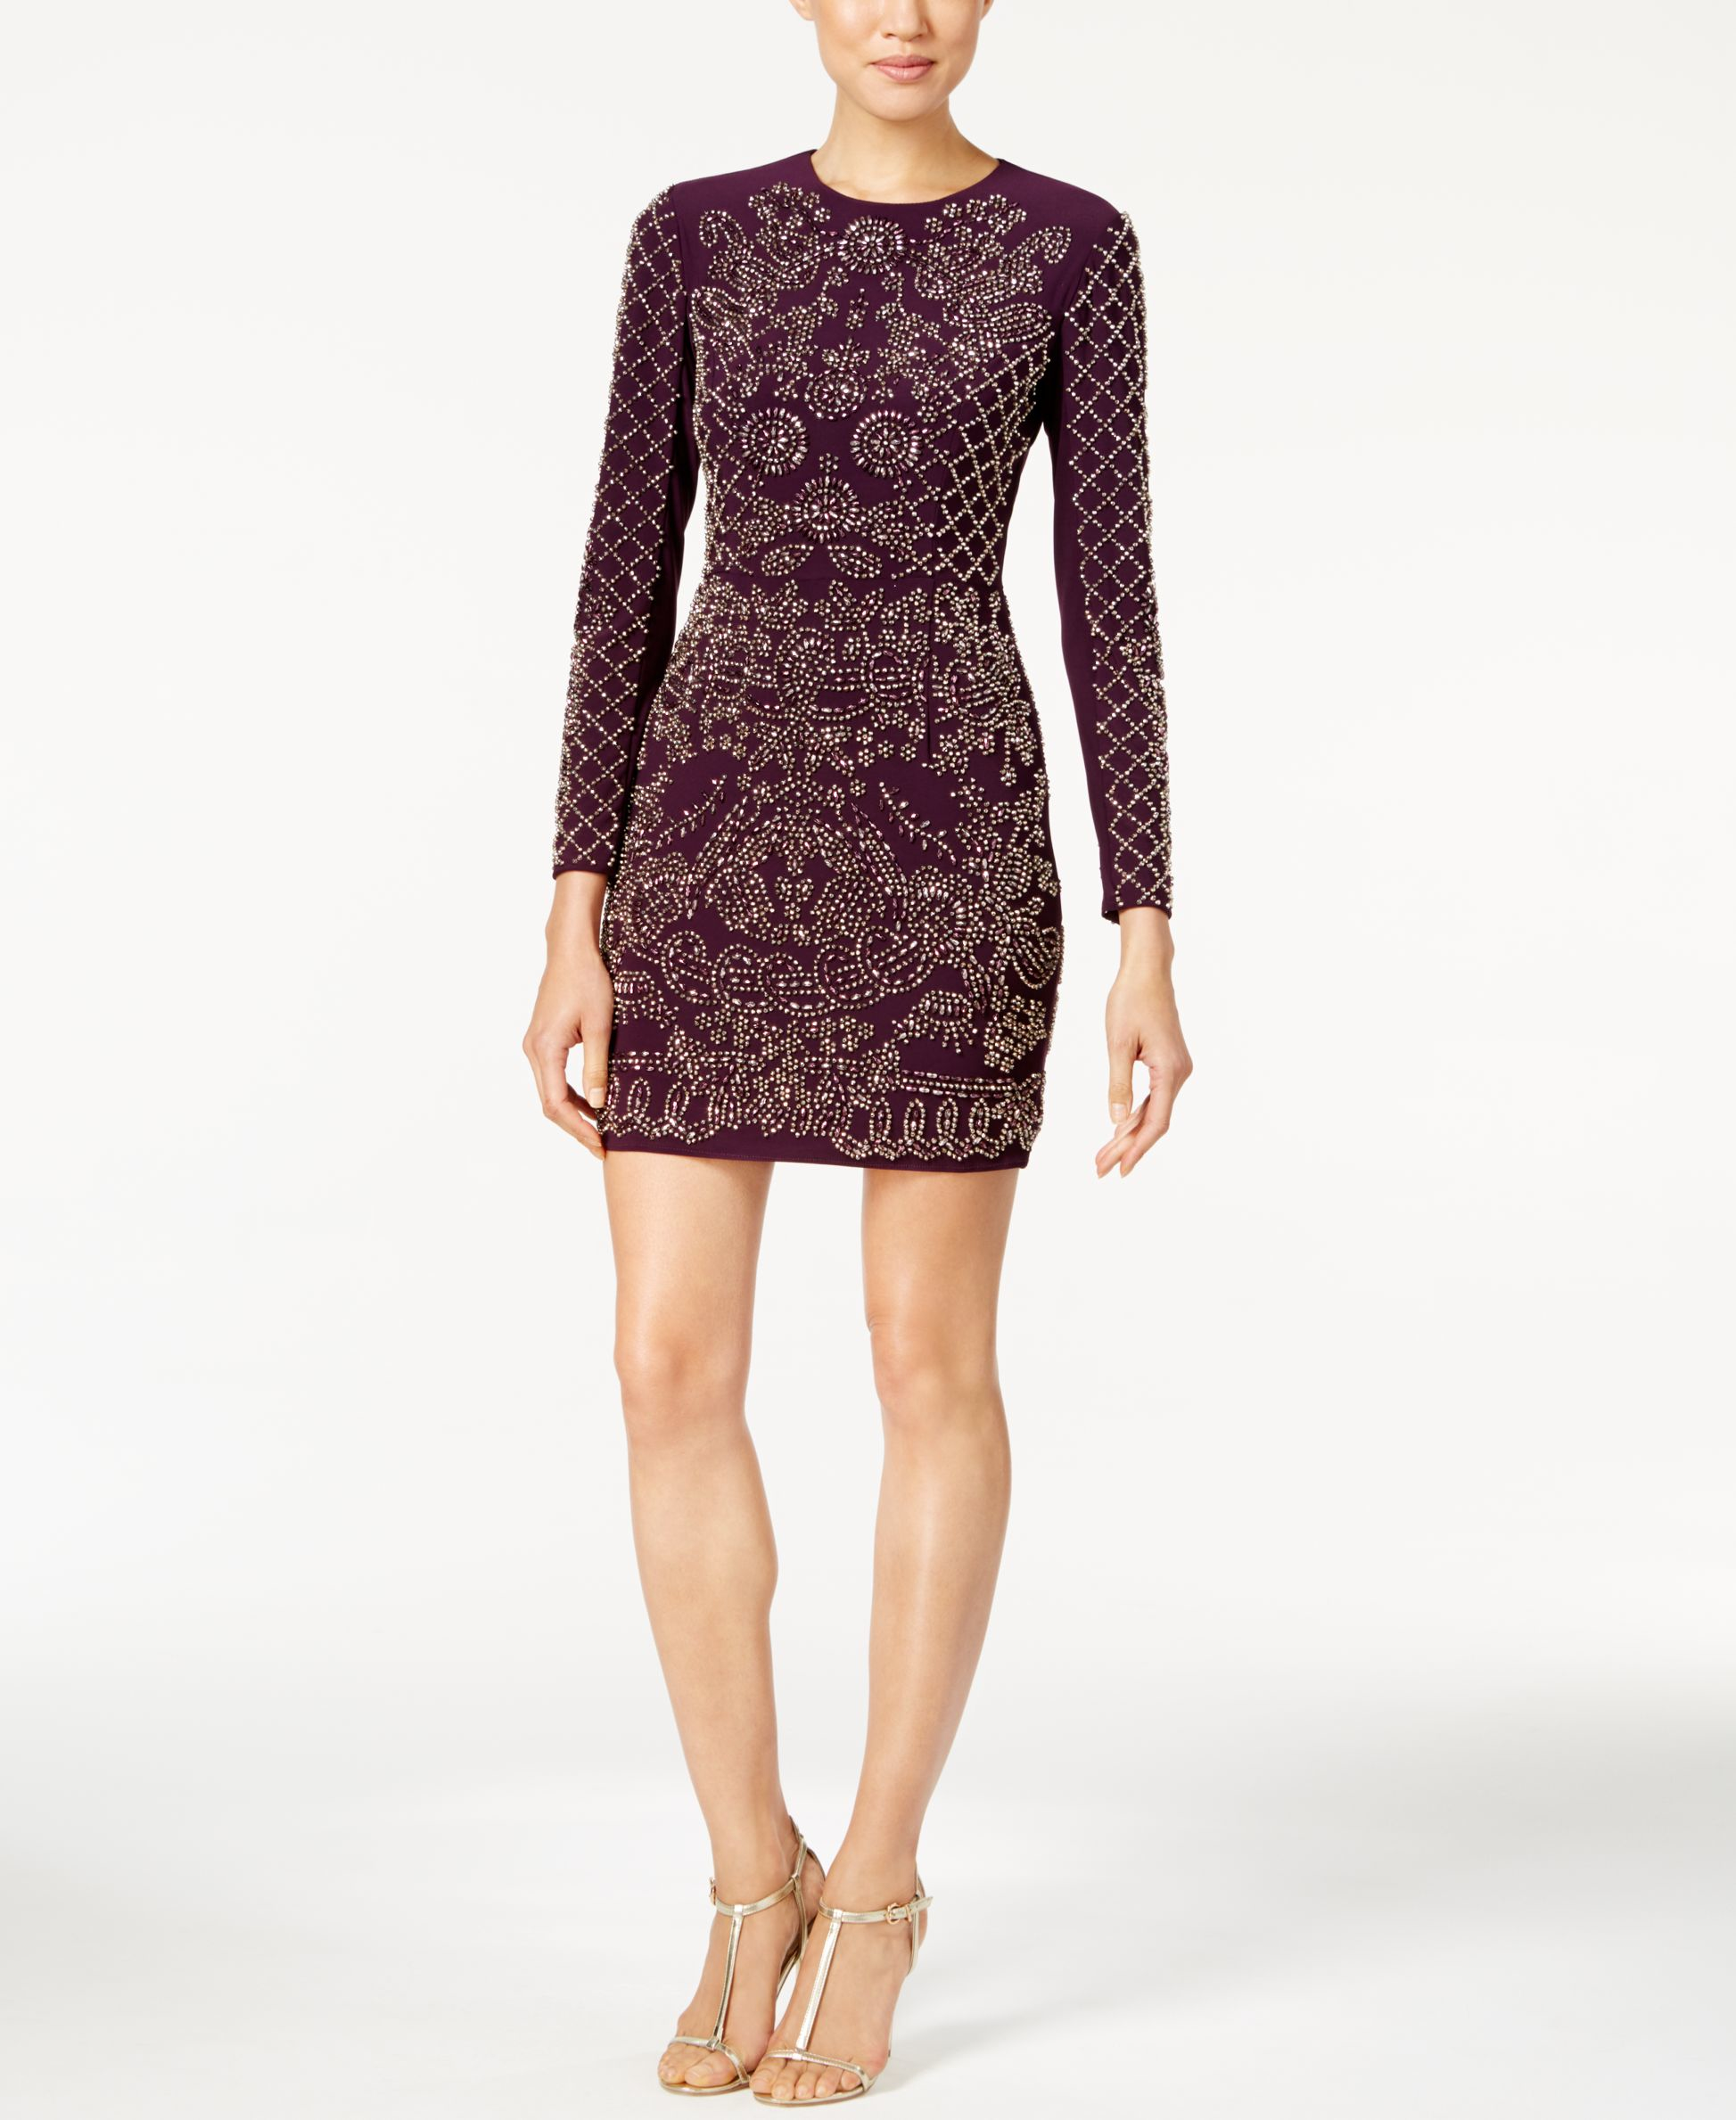 0f010897 Lyst - Xscape Laser-cut Overlay Halter Dress in Black